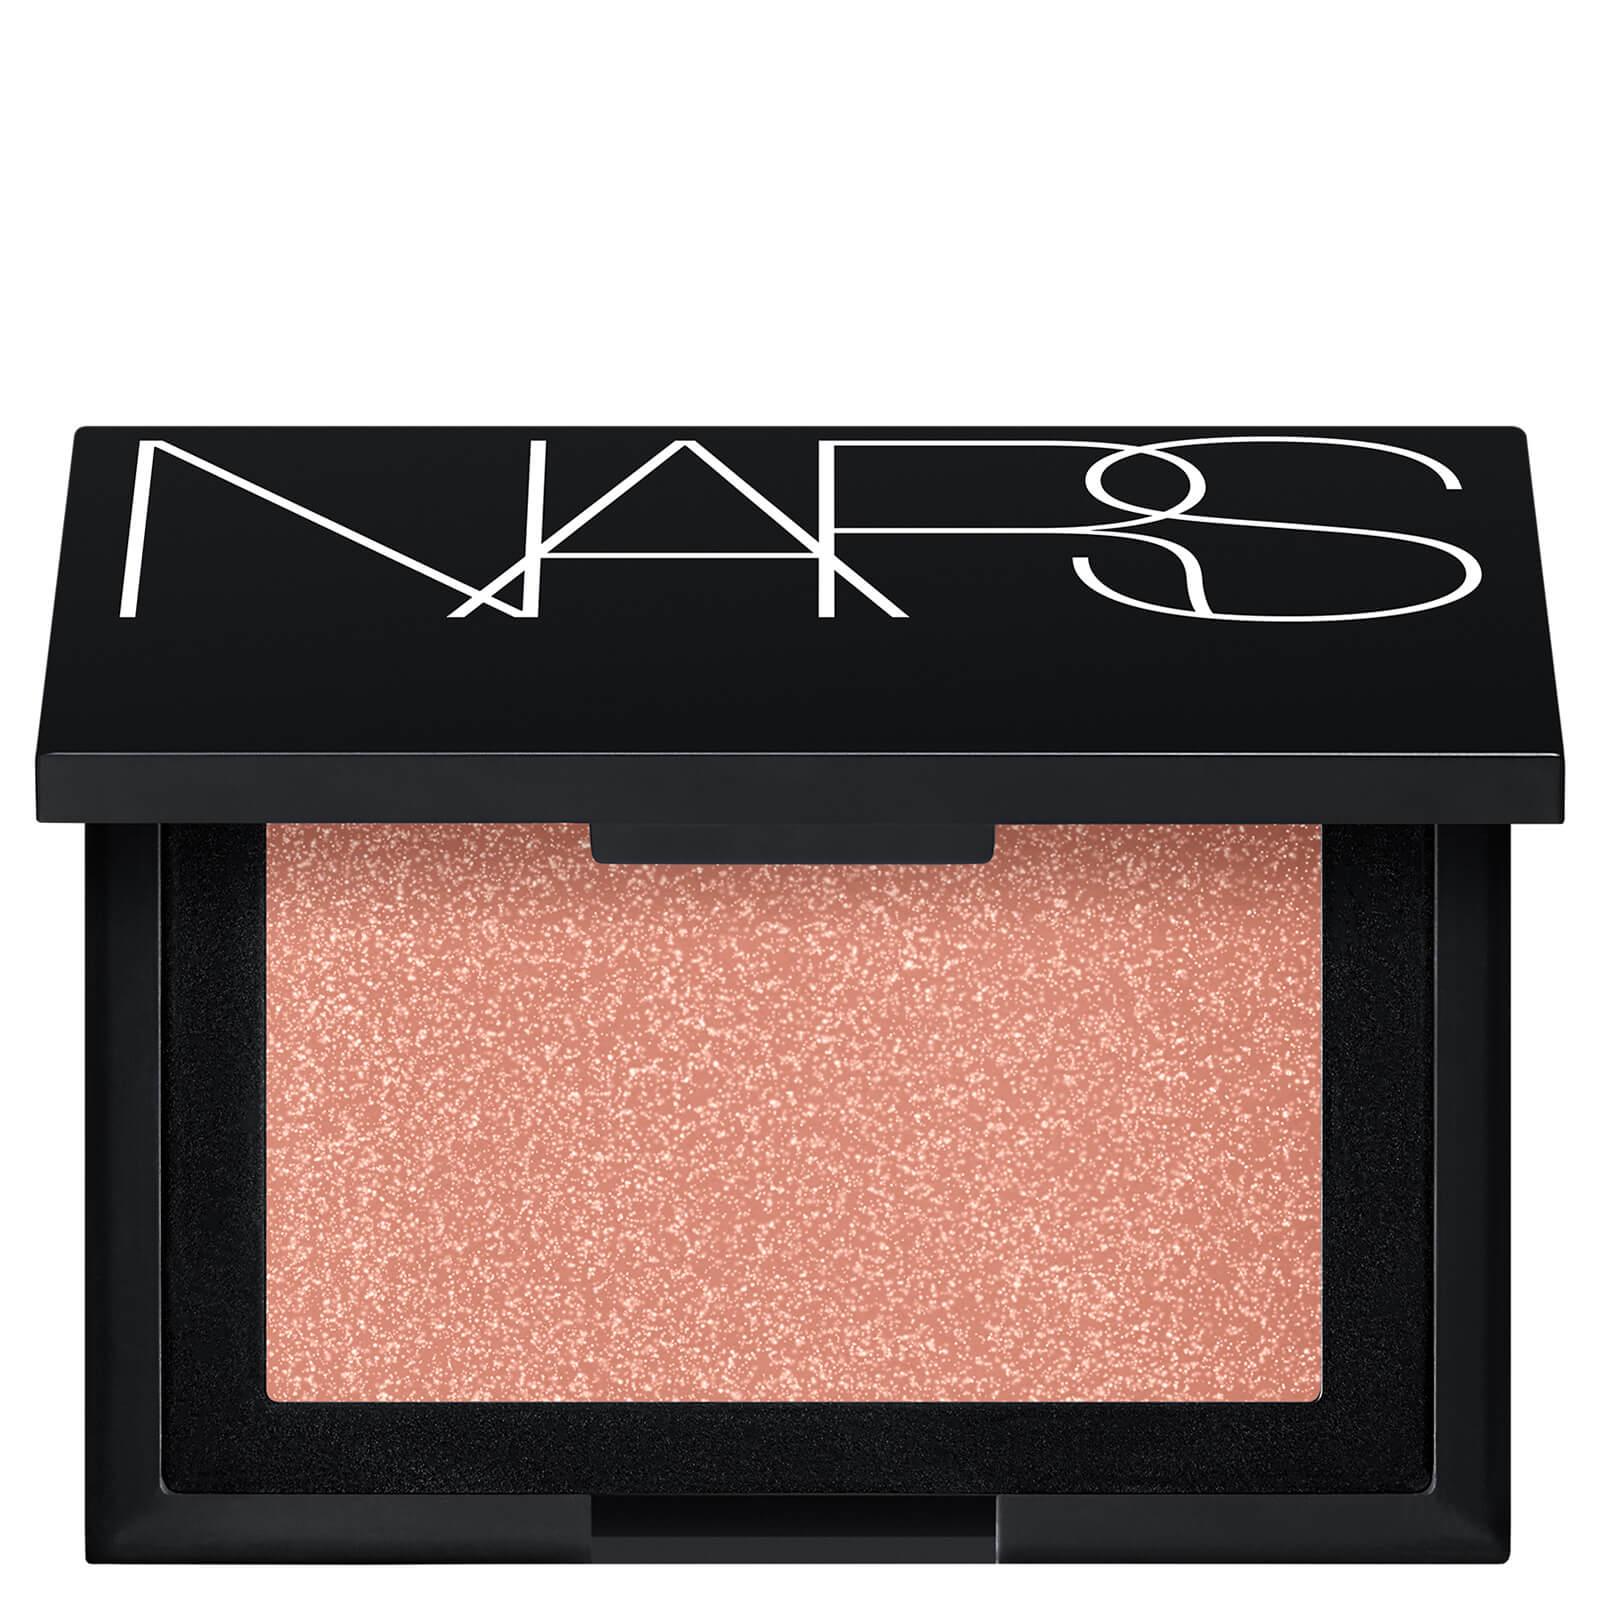 NARS Cosmetics Light Sculpting Highlighting Powder 8g (Various Shades) - Maldives